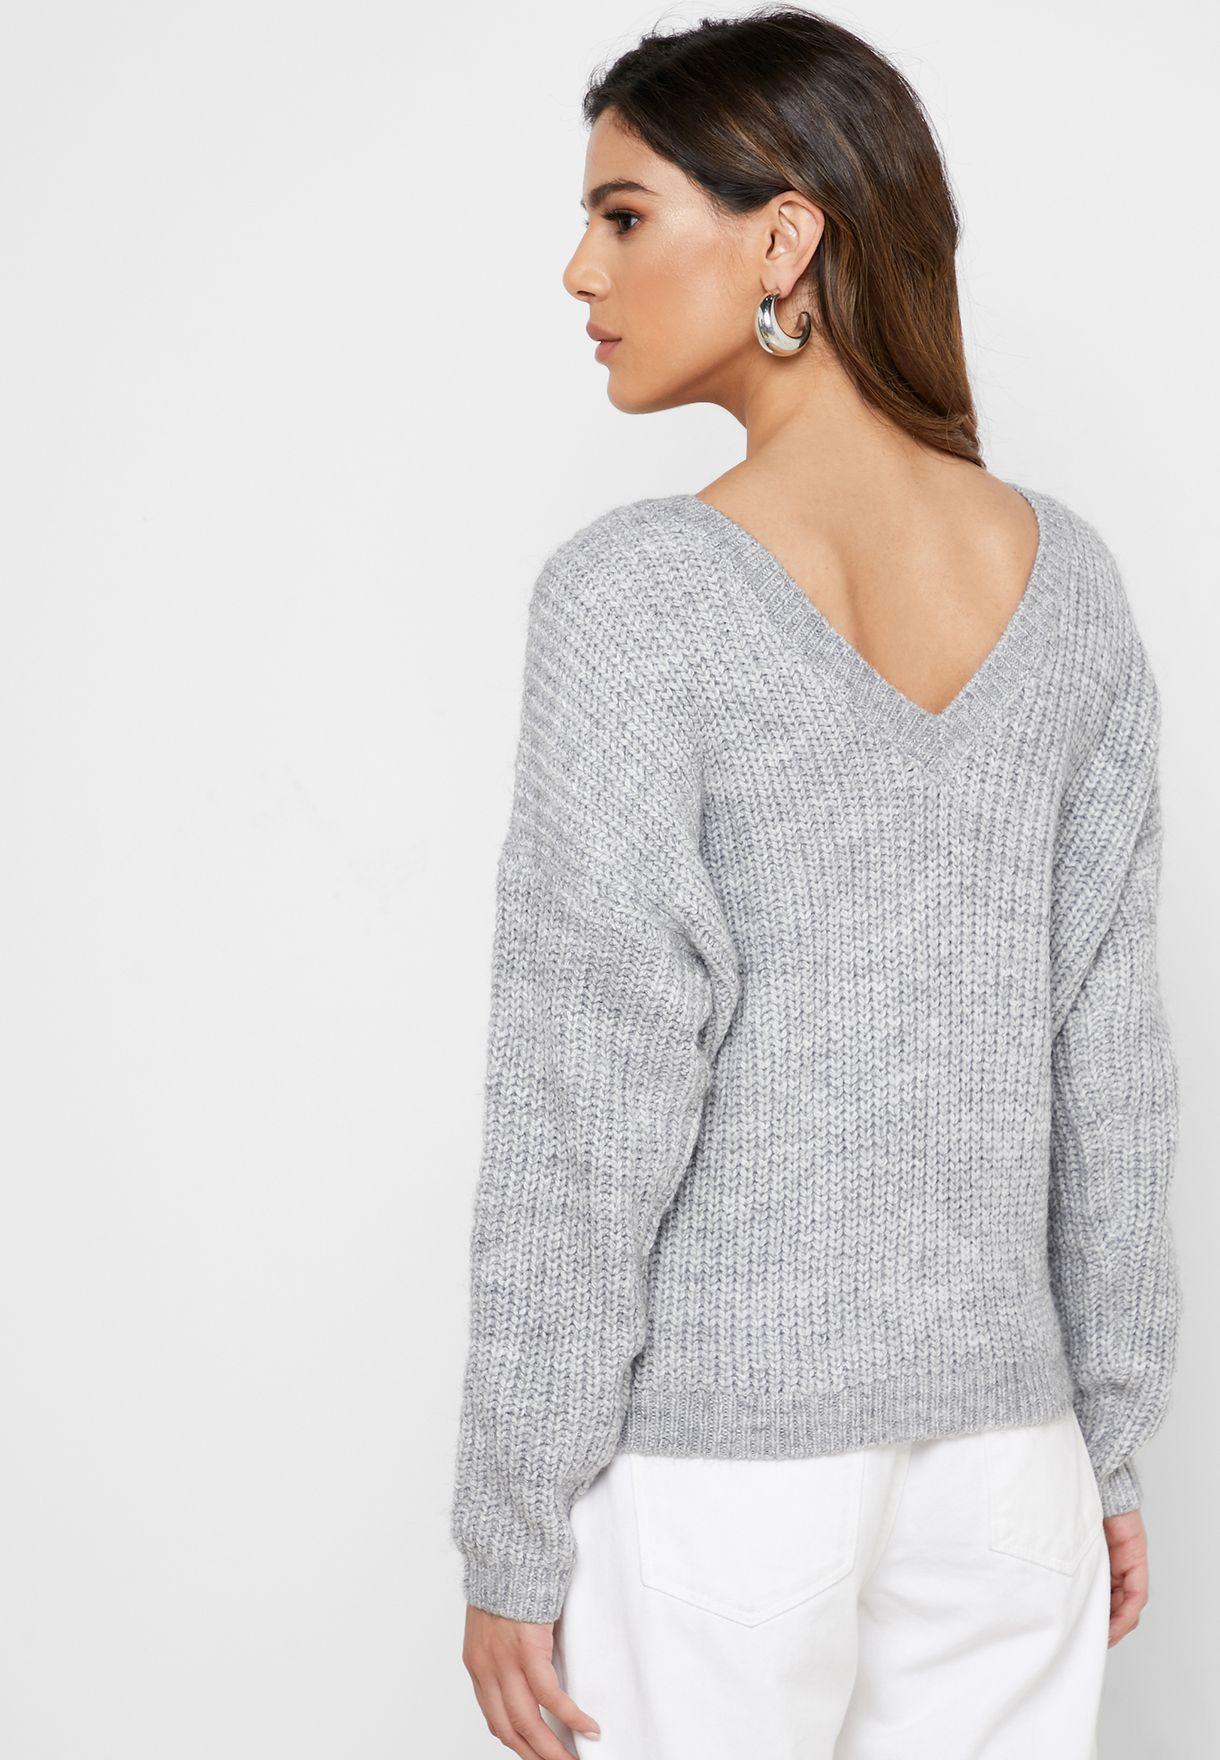 V- Back Heavy Knit Sweater